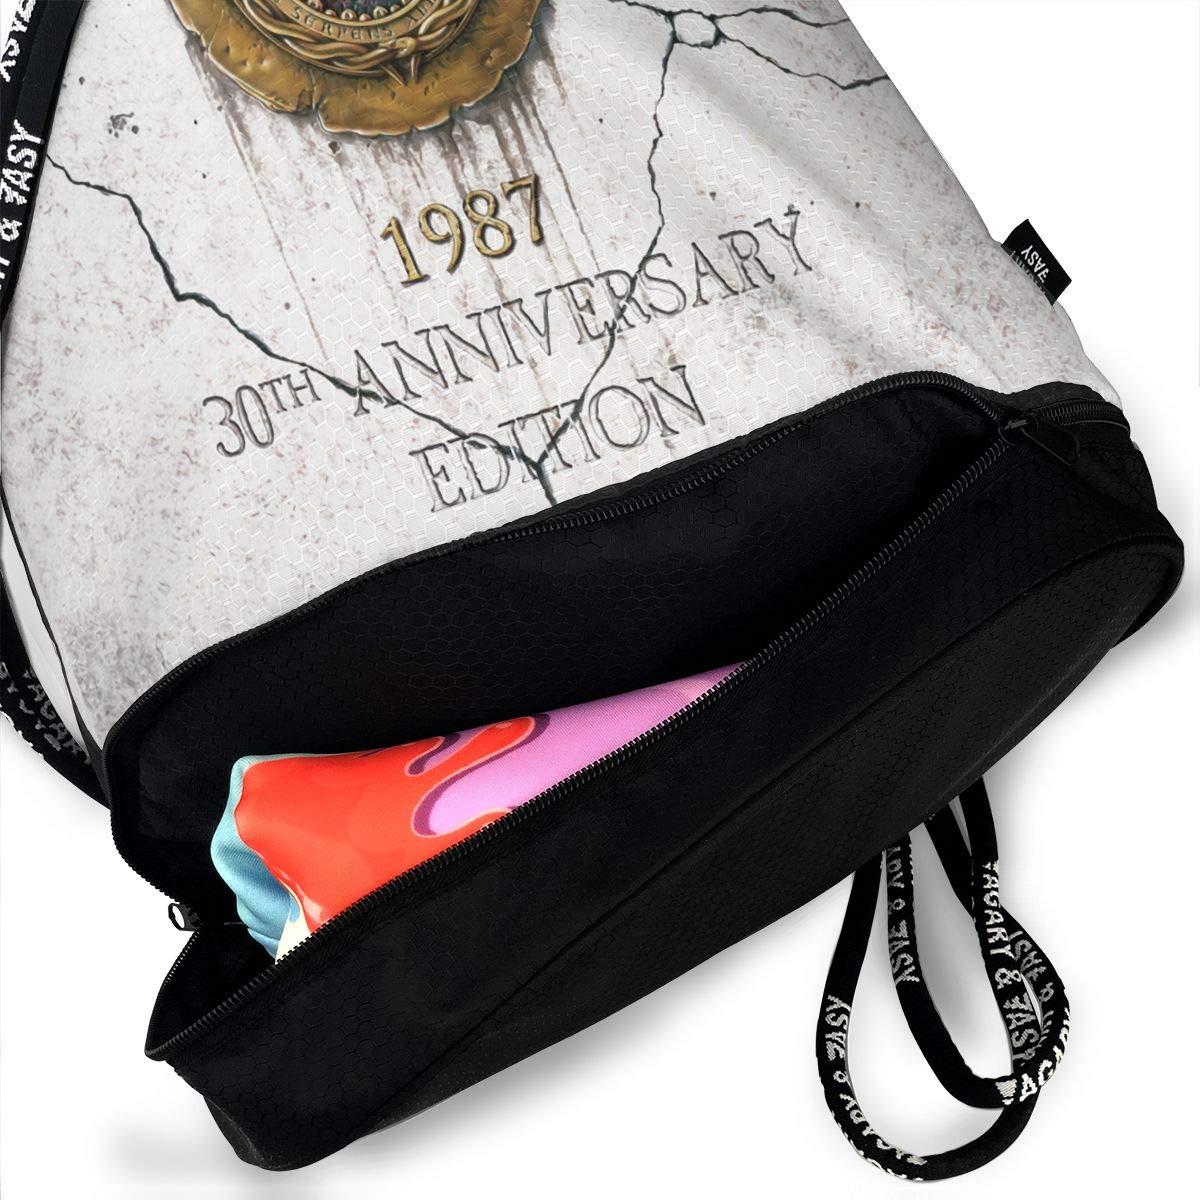 Chenjunyi Whitesnake 30th Anniversary Drawstring Backpack Foldable Gym Tote Dance Bag for Swimming Shopping Sports Women Men Boys Girls